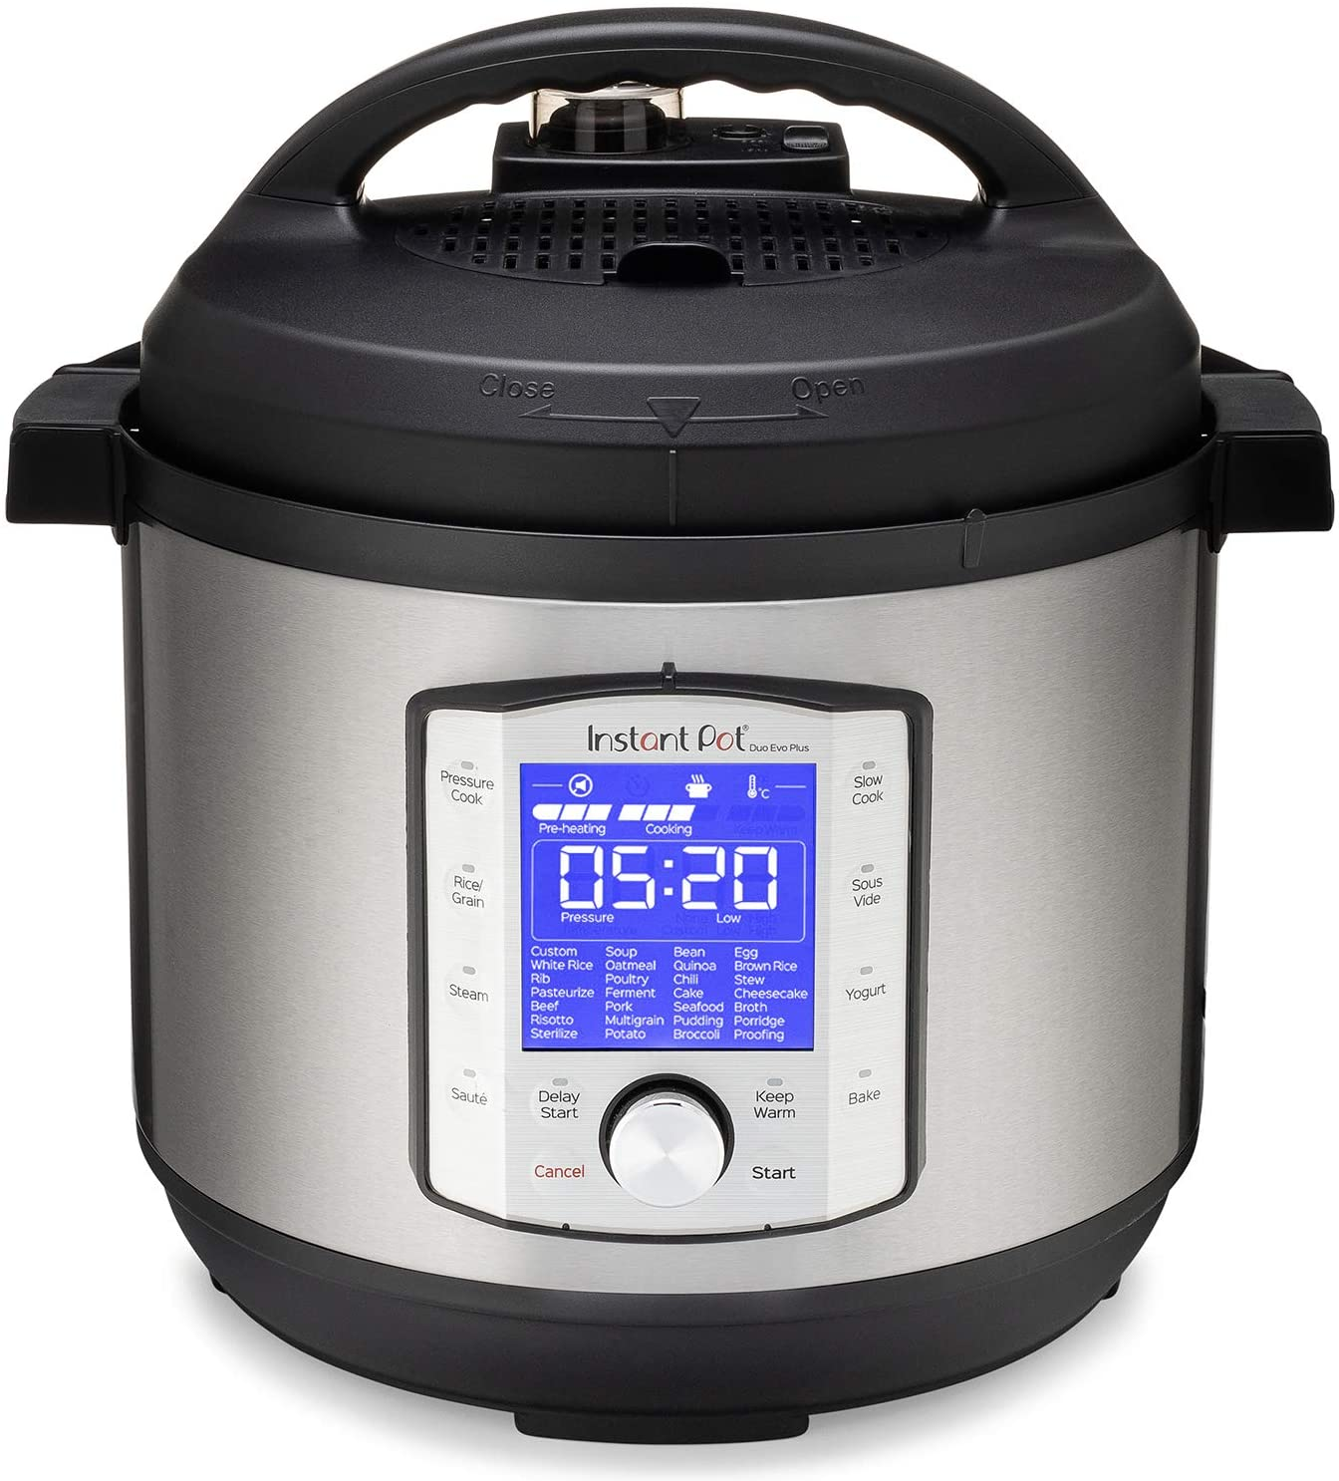 Instant Pot Duo Evo Plus 9-in-1 Electric Pressure Cooker, Sterilizer, Slow Cooker, Rice Cooker, Grain Maker, Steamer, Saute, Yogurt Maker, Sous Vide, Bake, and Warmer, 8 Quart, 10 Programs